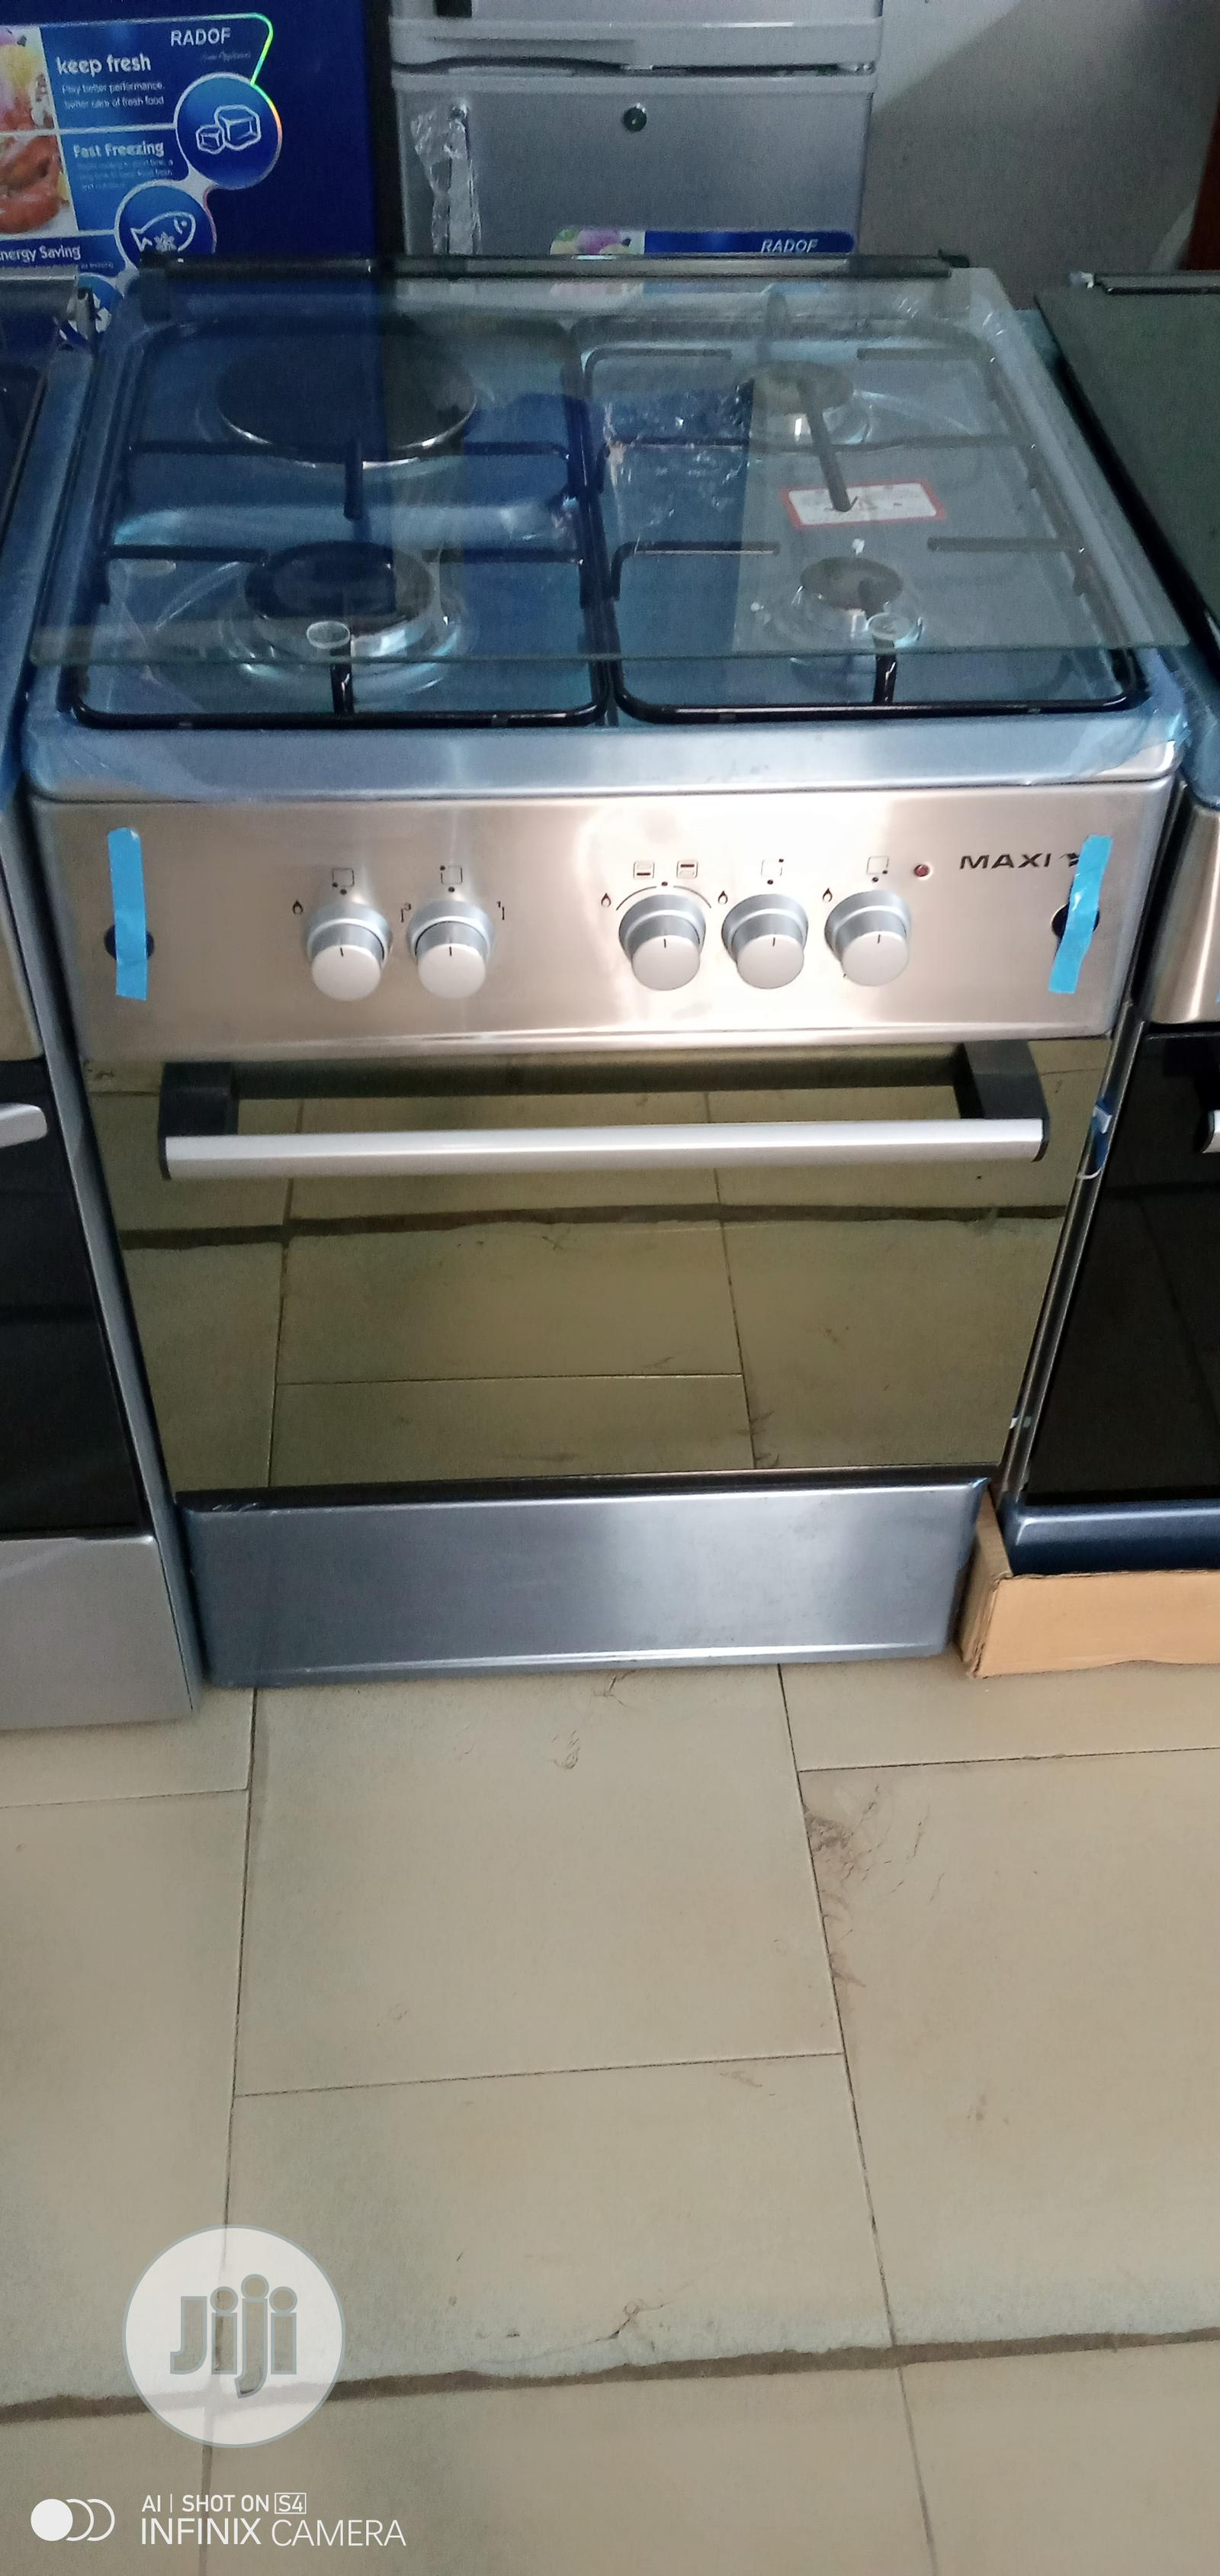 MAXI Gas Cooker 6060 3 Gas + 1 Electric Burner | Kitchen Appliances for sale in Benin City, Edo State, Nigeria